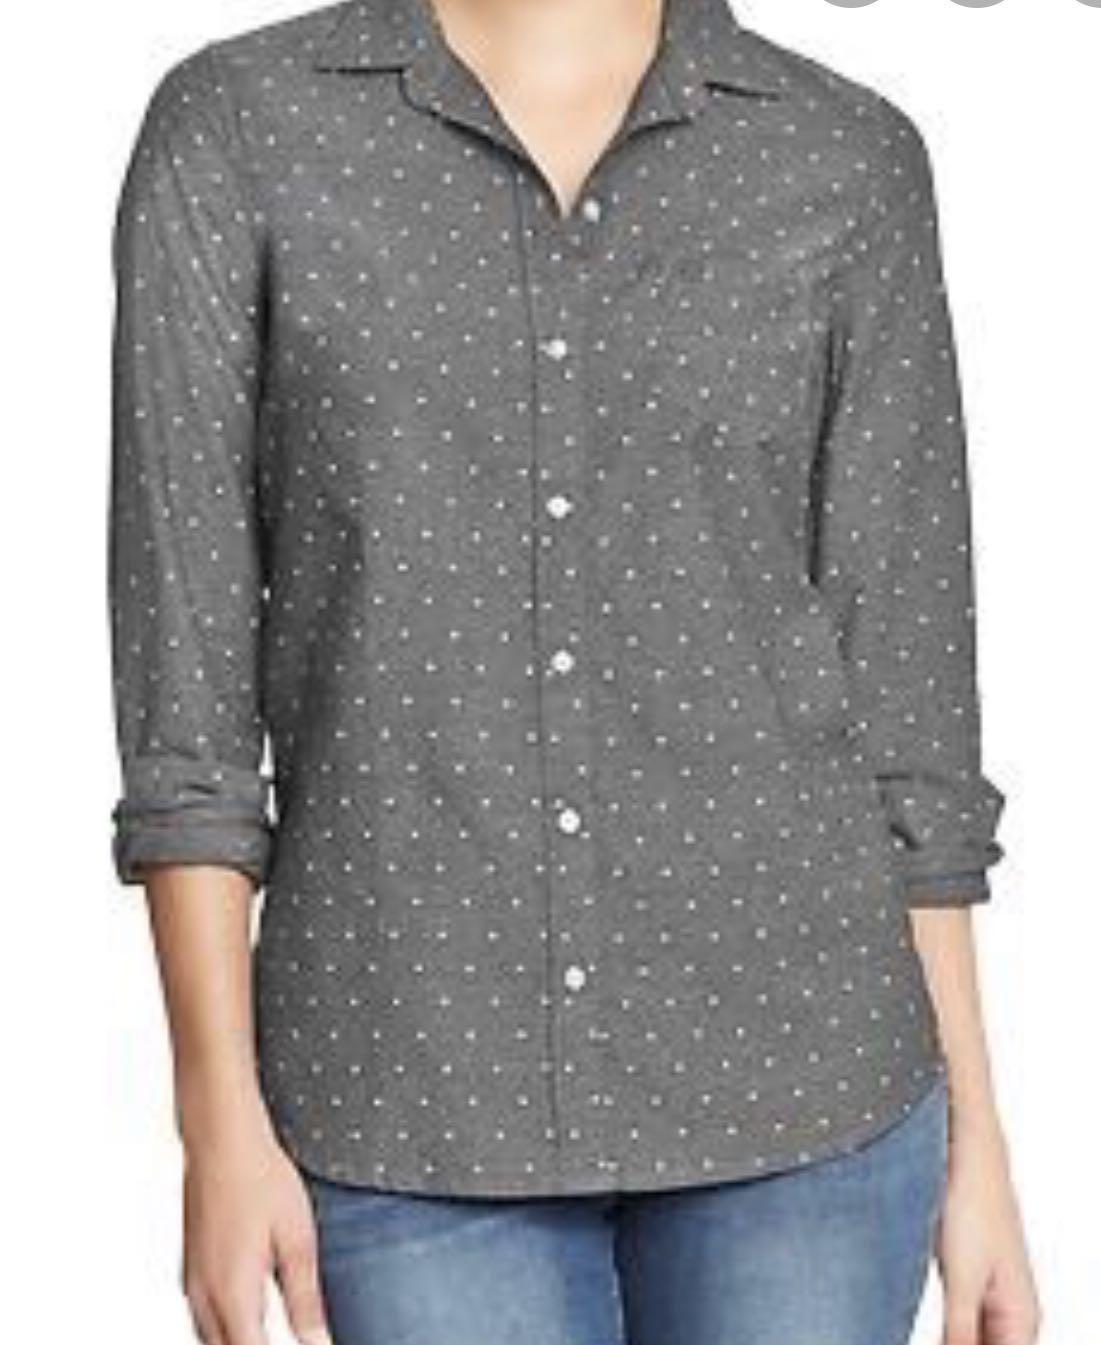 Old Navy Classic Polka Dot Oxford Shirt